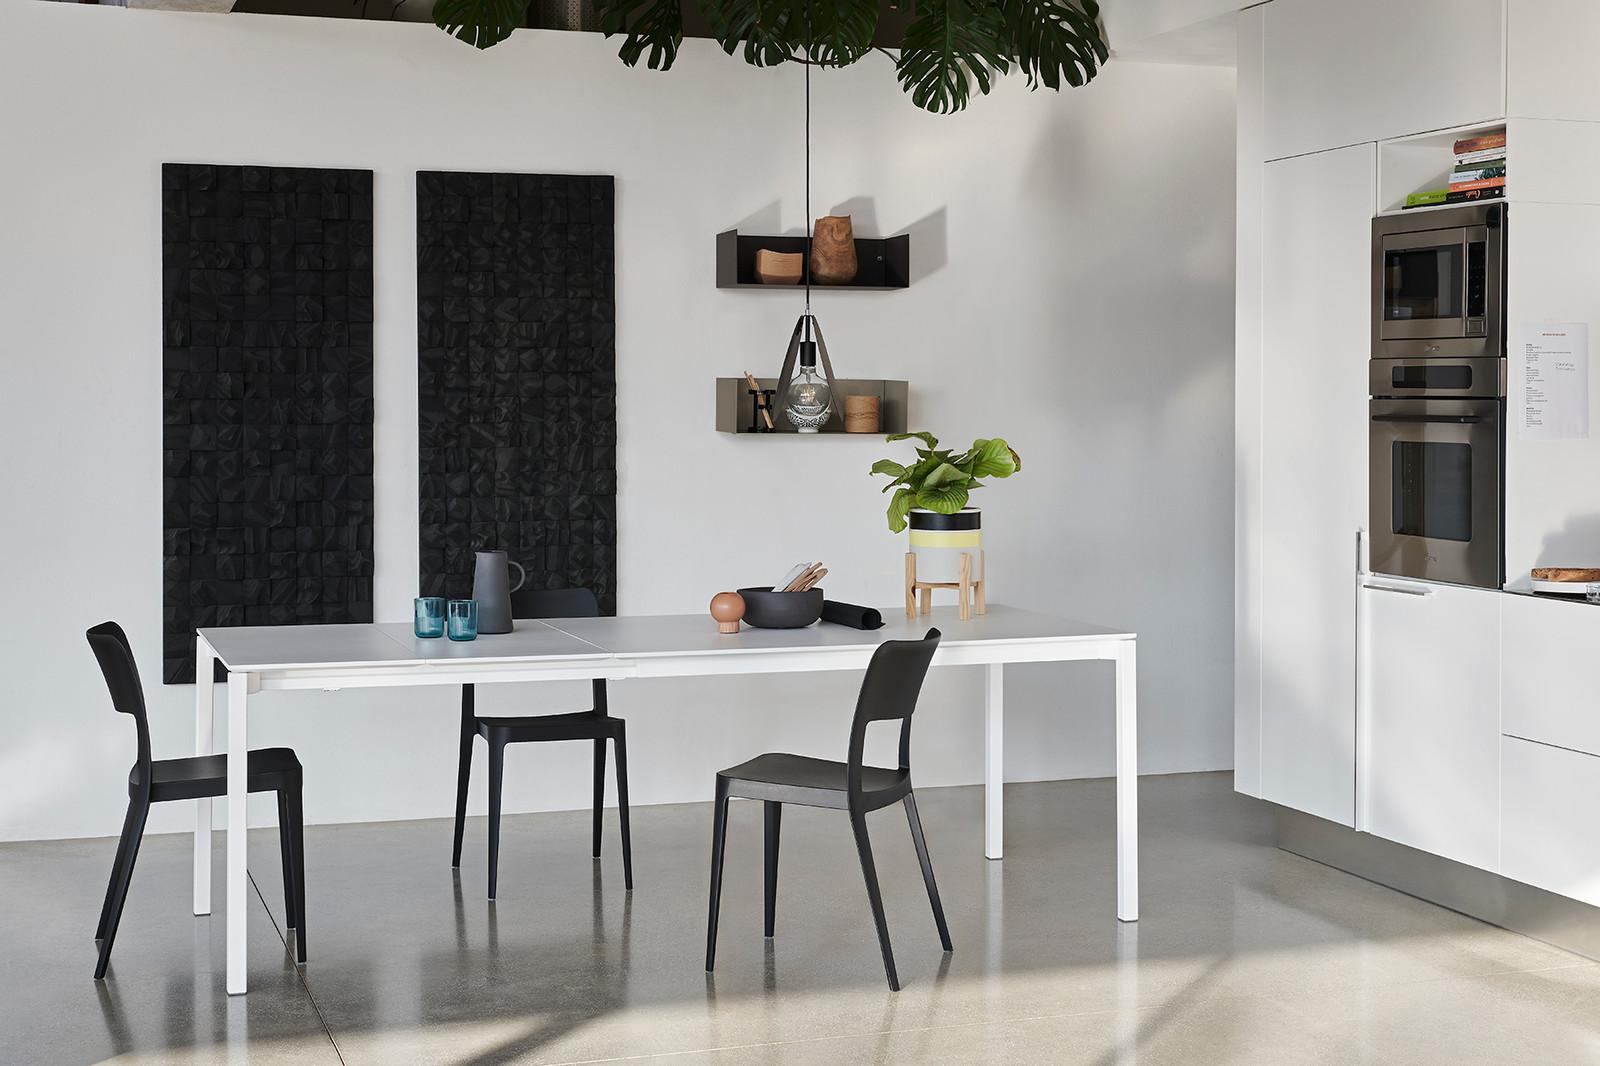 Umbau  Einrichtung  Zrich  Dorian Huber Interiors